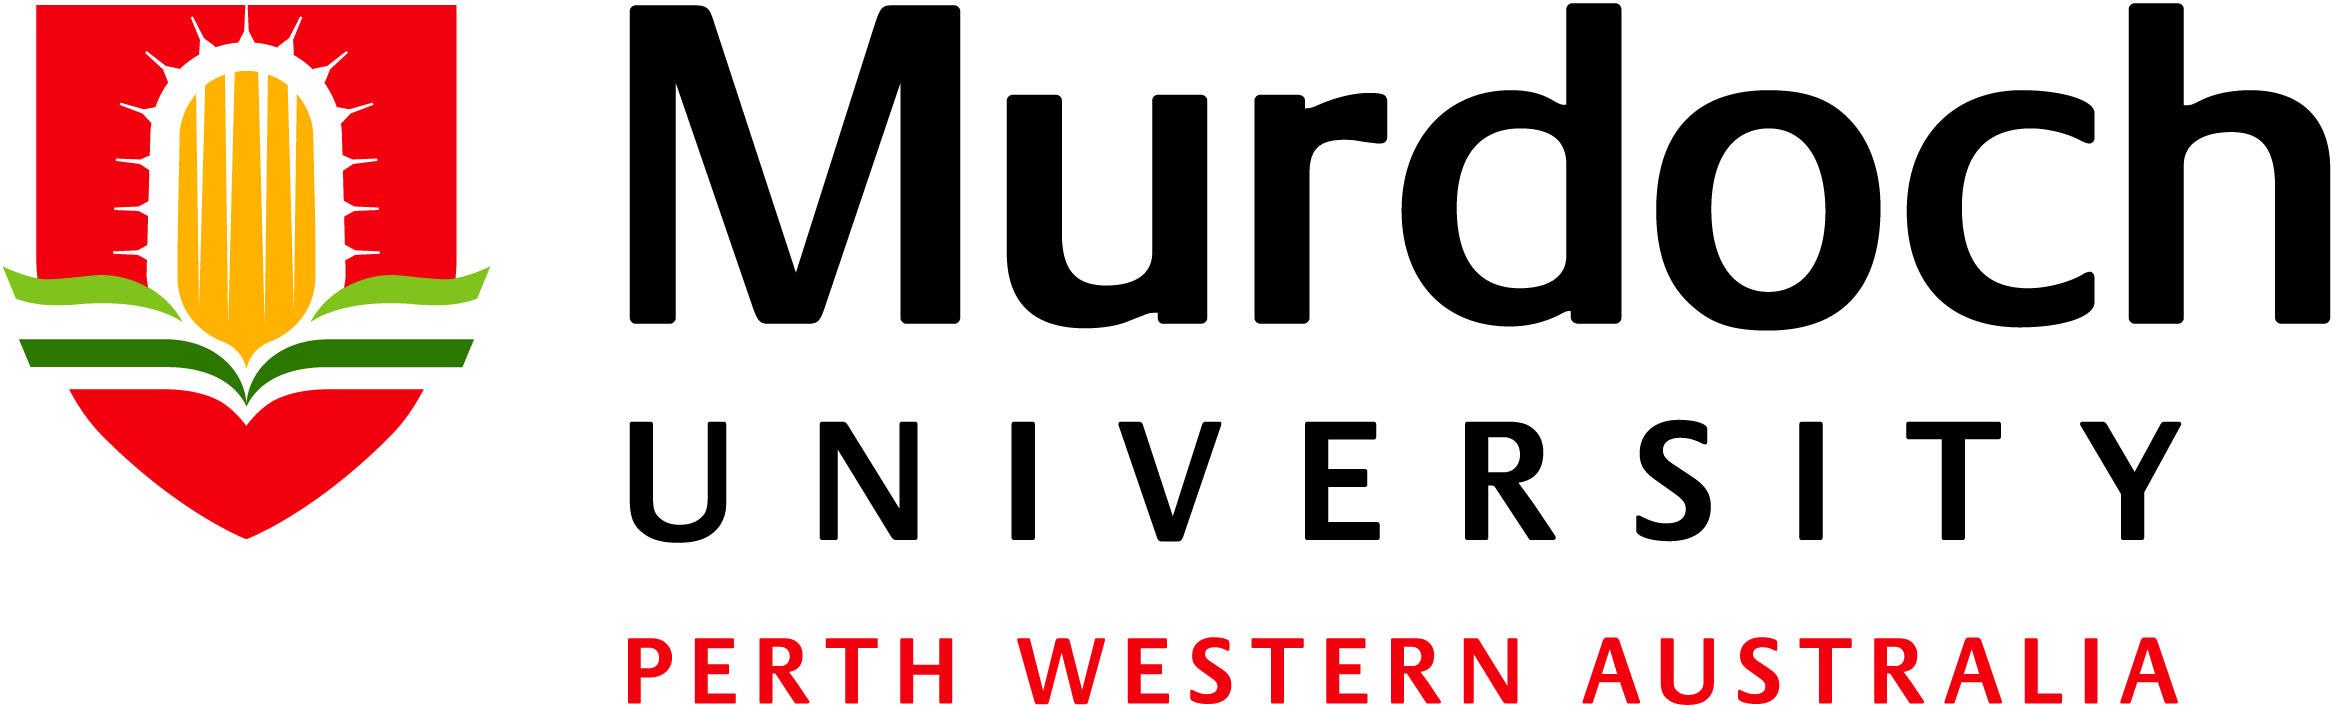 http://www.murdoch.edu.au/Courses/Mobile-and-Web-Application-Development/